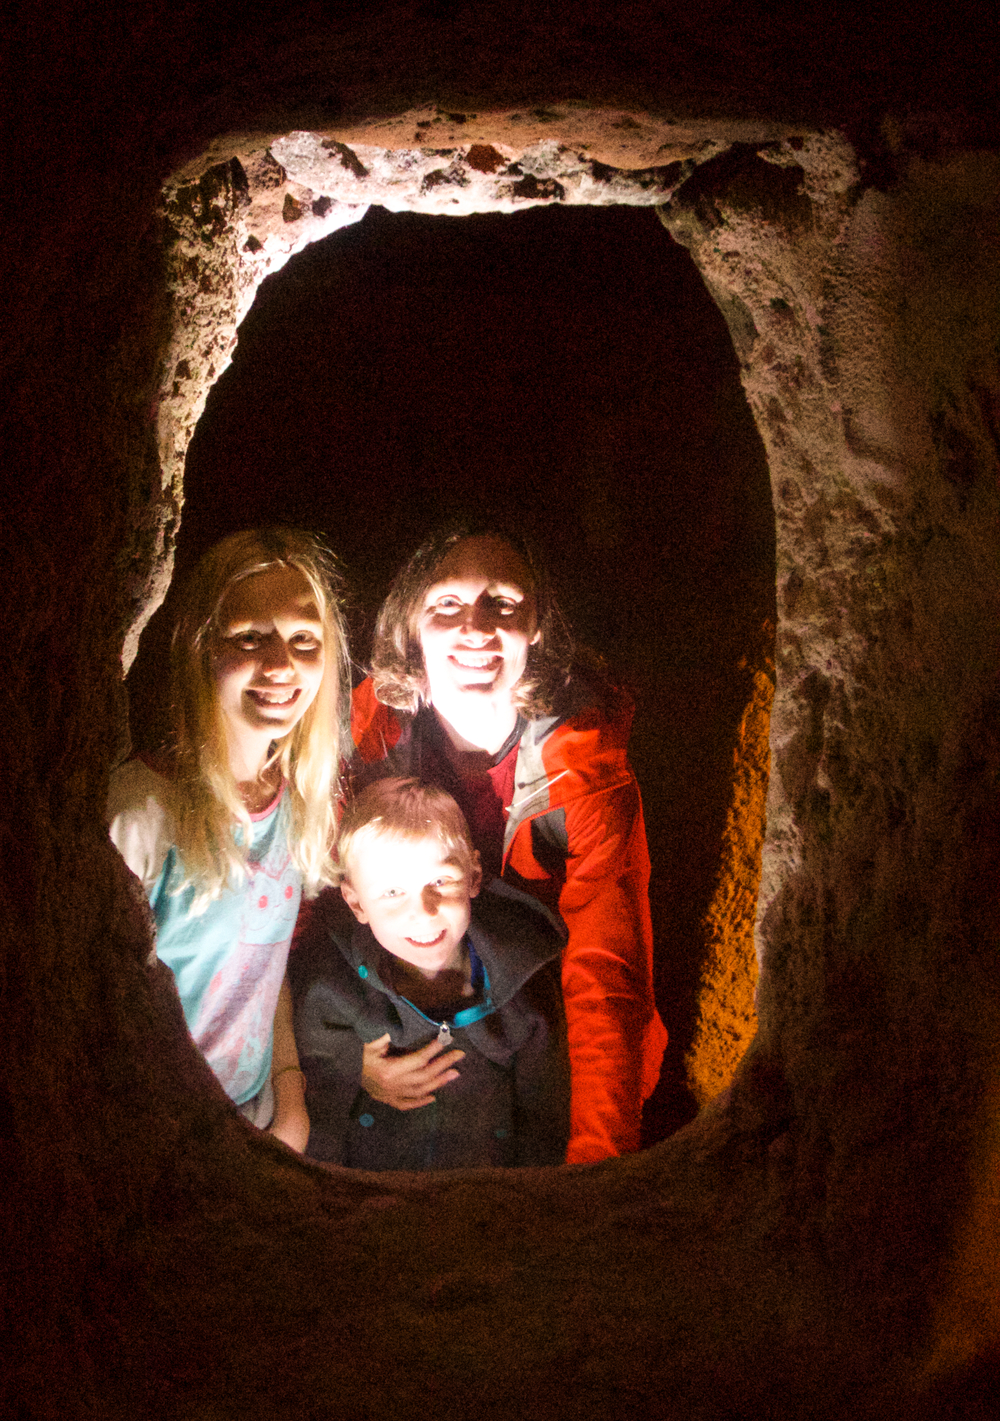 cappadocia-underground 6.jpg